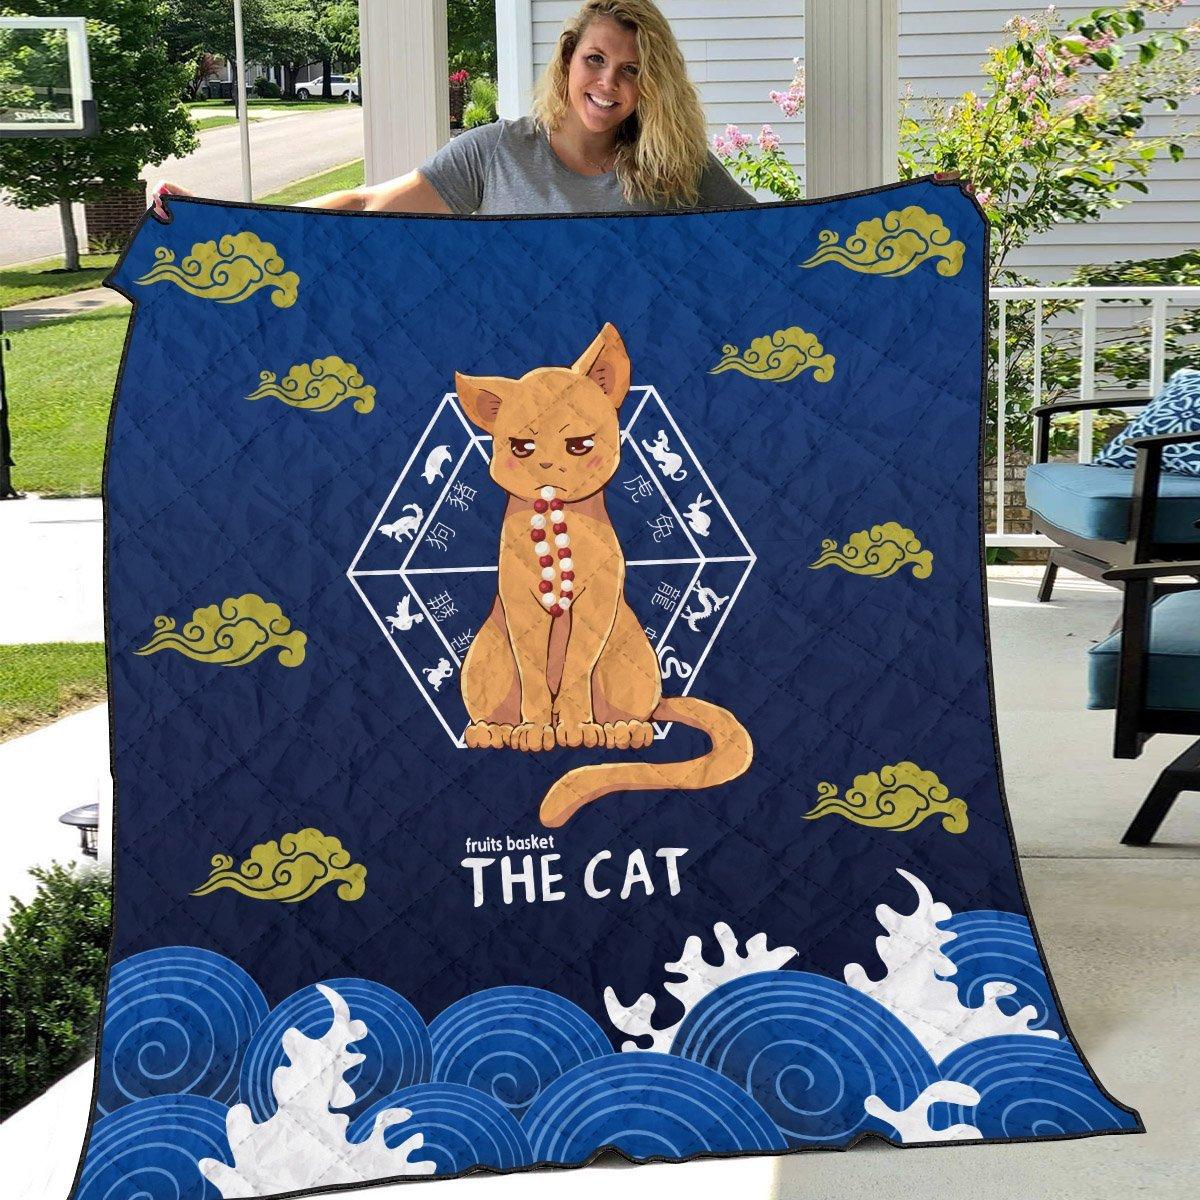 kyo the cat quilt blanket 177715 - Otaku Treat